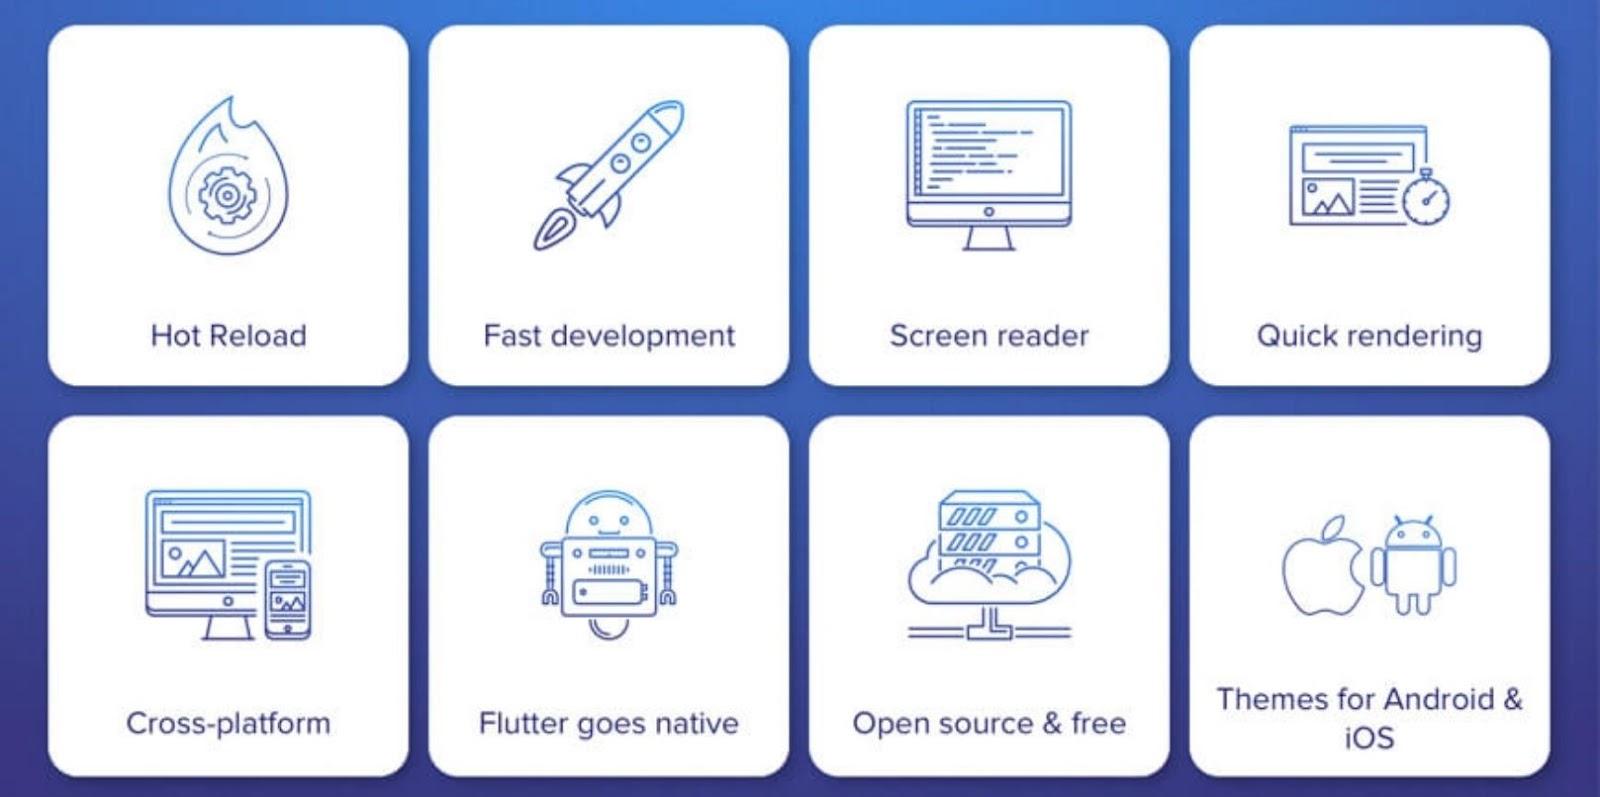 Advantage of Developing a Cross-platform app with flutter